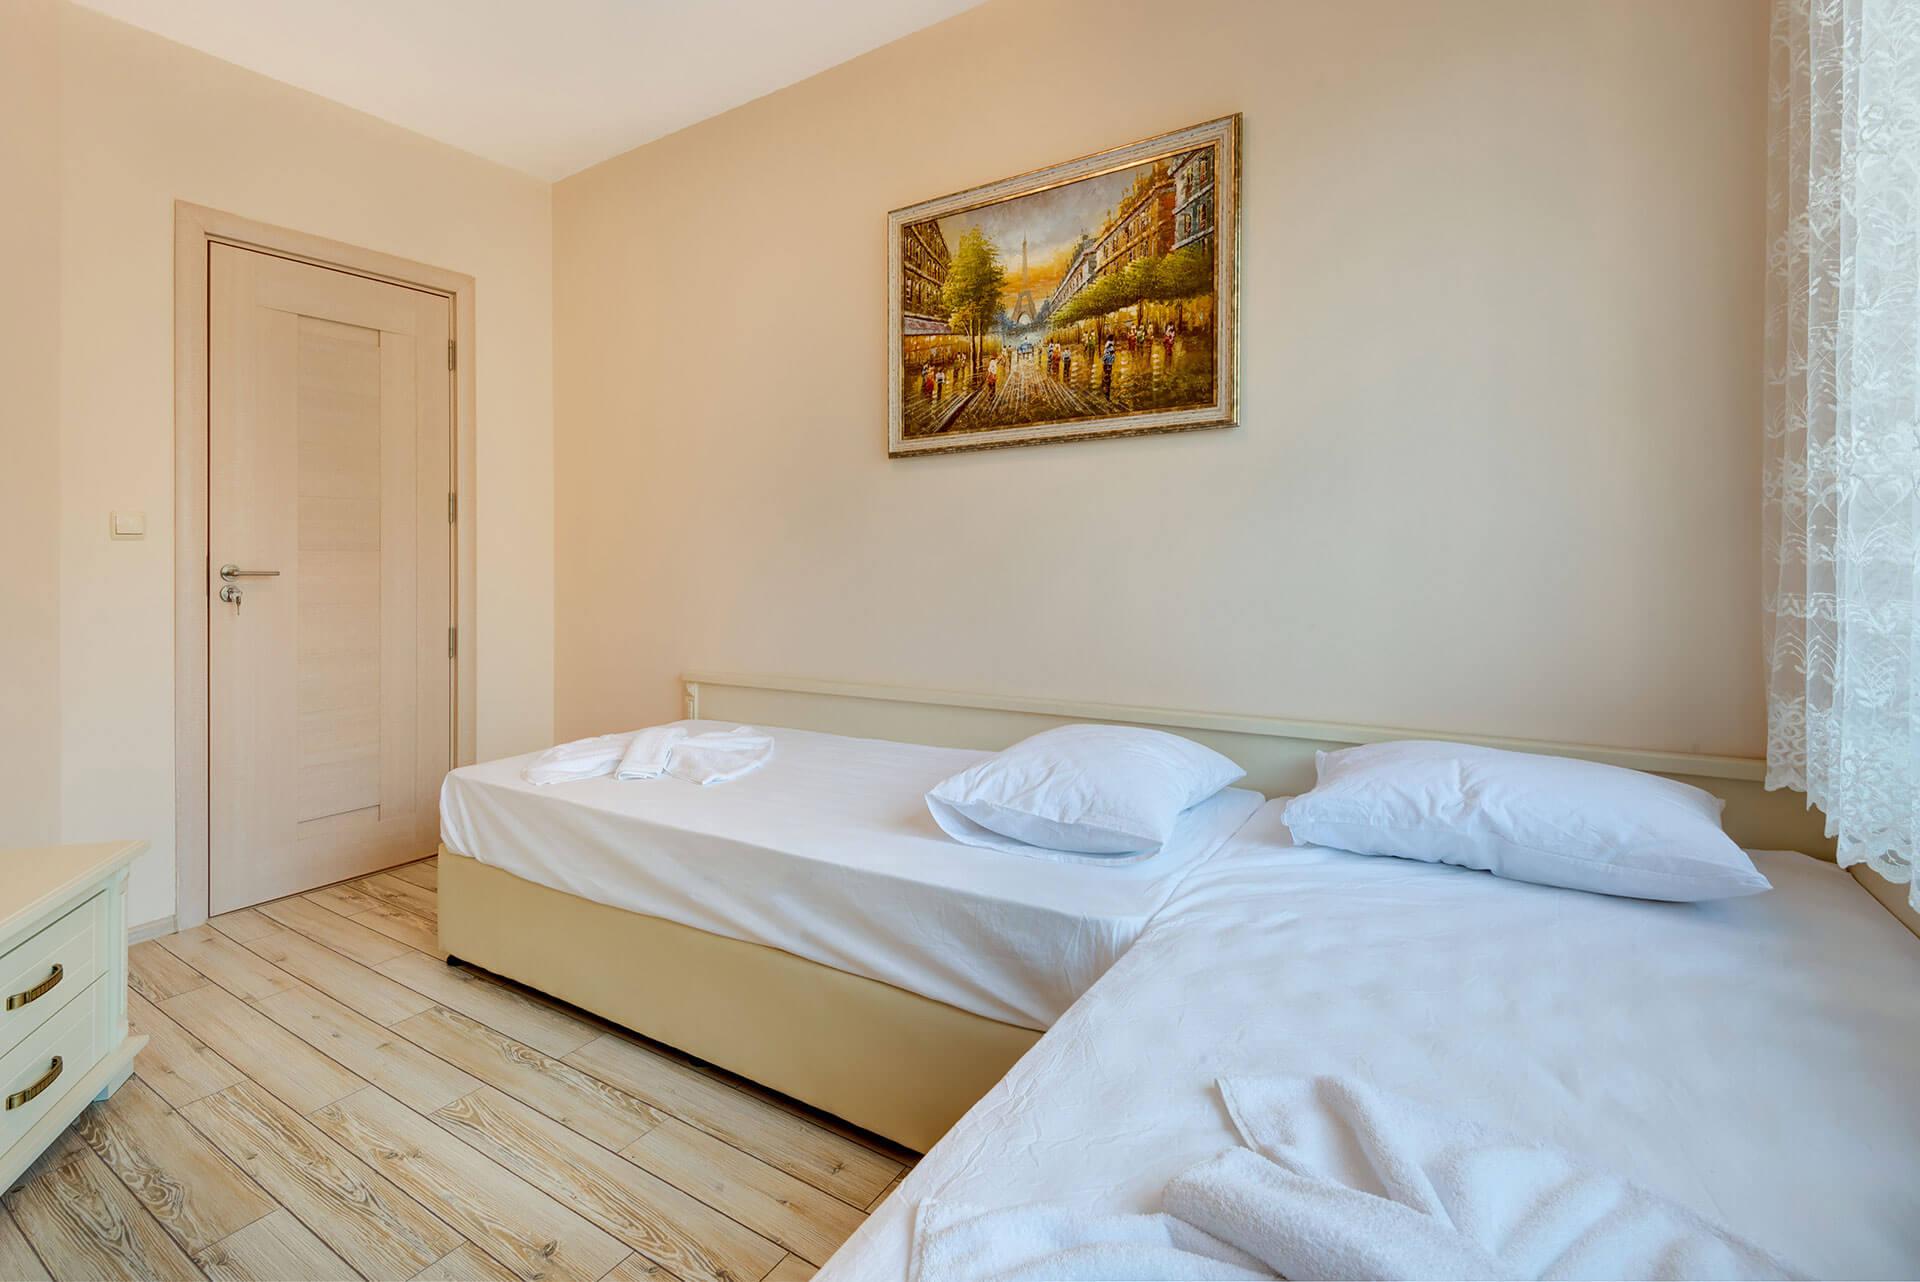 Апартамент с 2 спални, под наем в комплекс Артур, гр. Свети Влас